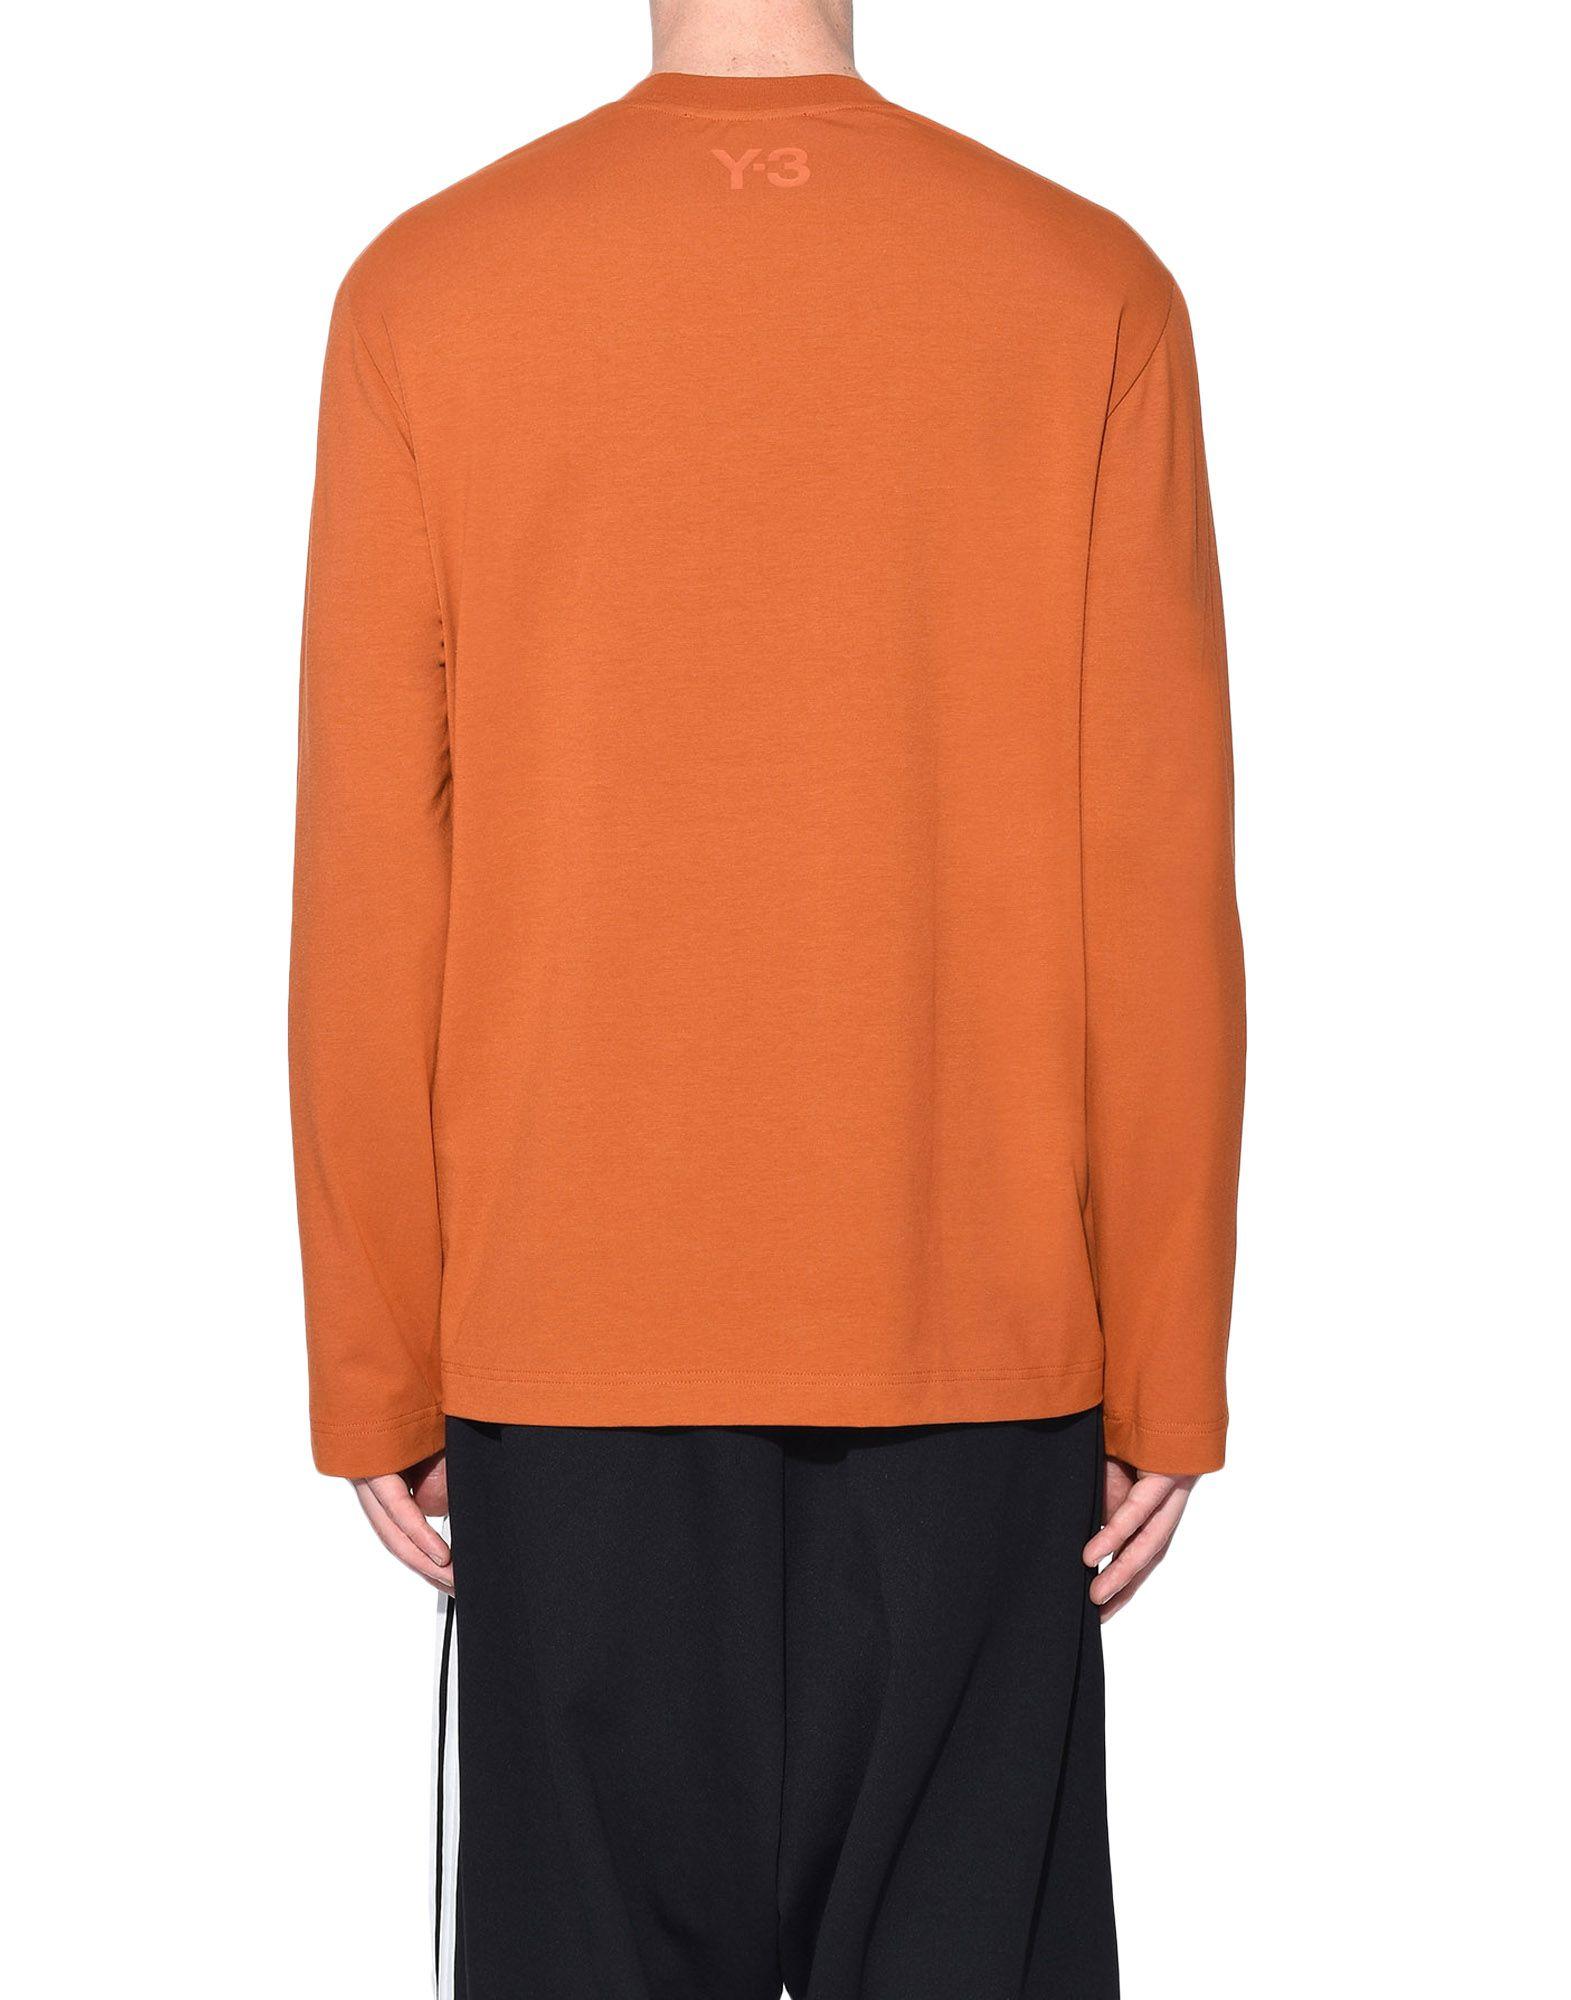 Y-3 Y-3 3-Stripes Tee Long sleeve t-shirt Man d